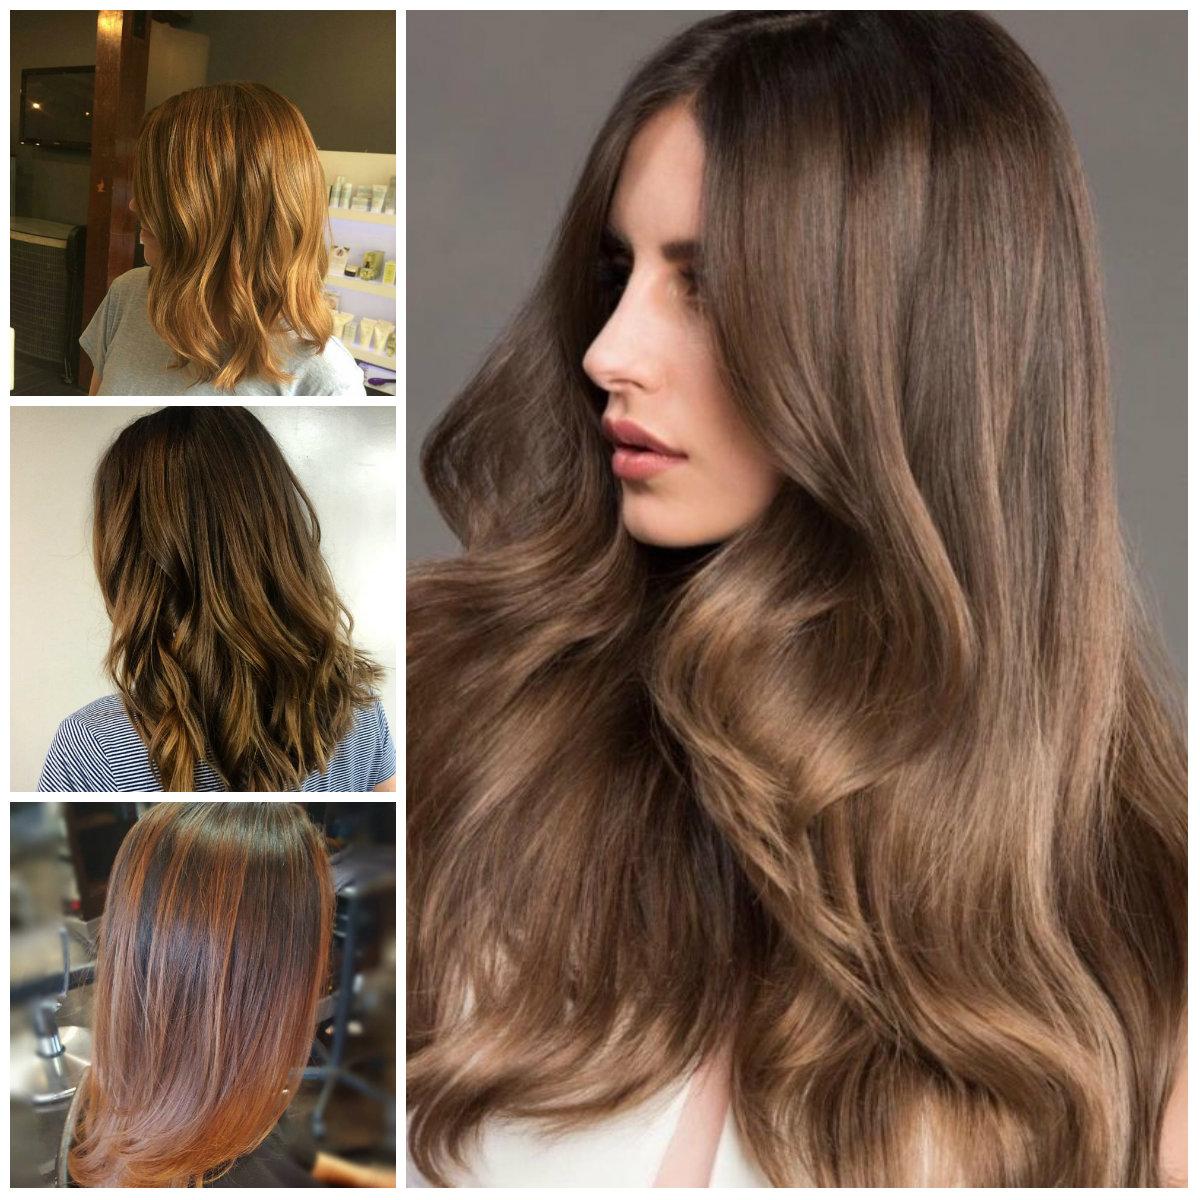 Light and Dark Golden Brown Hair Ideas for 2022